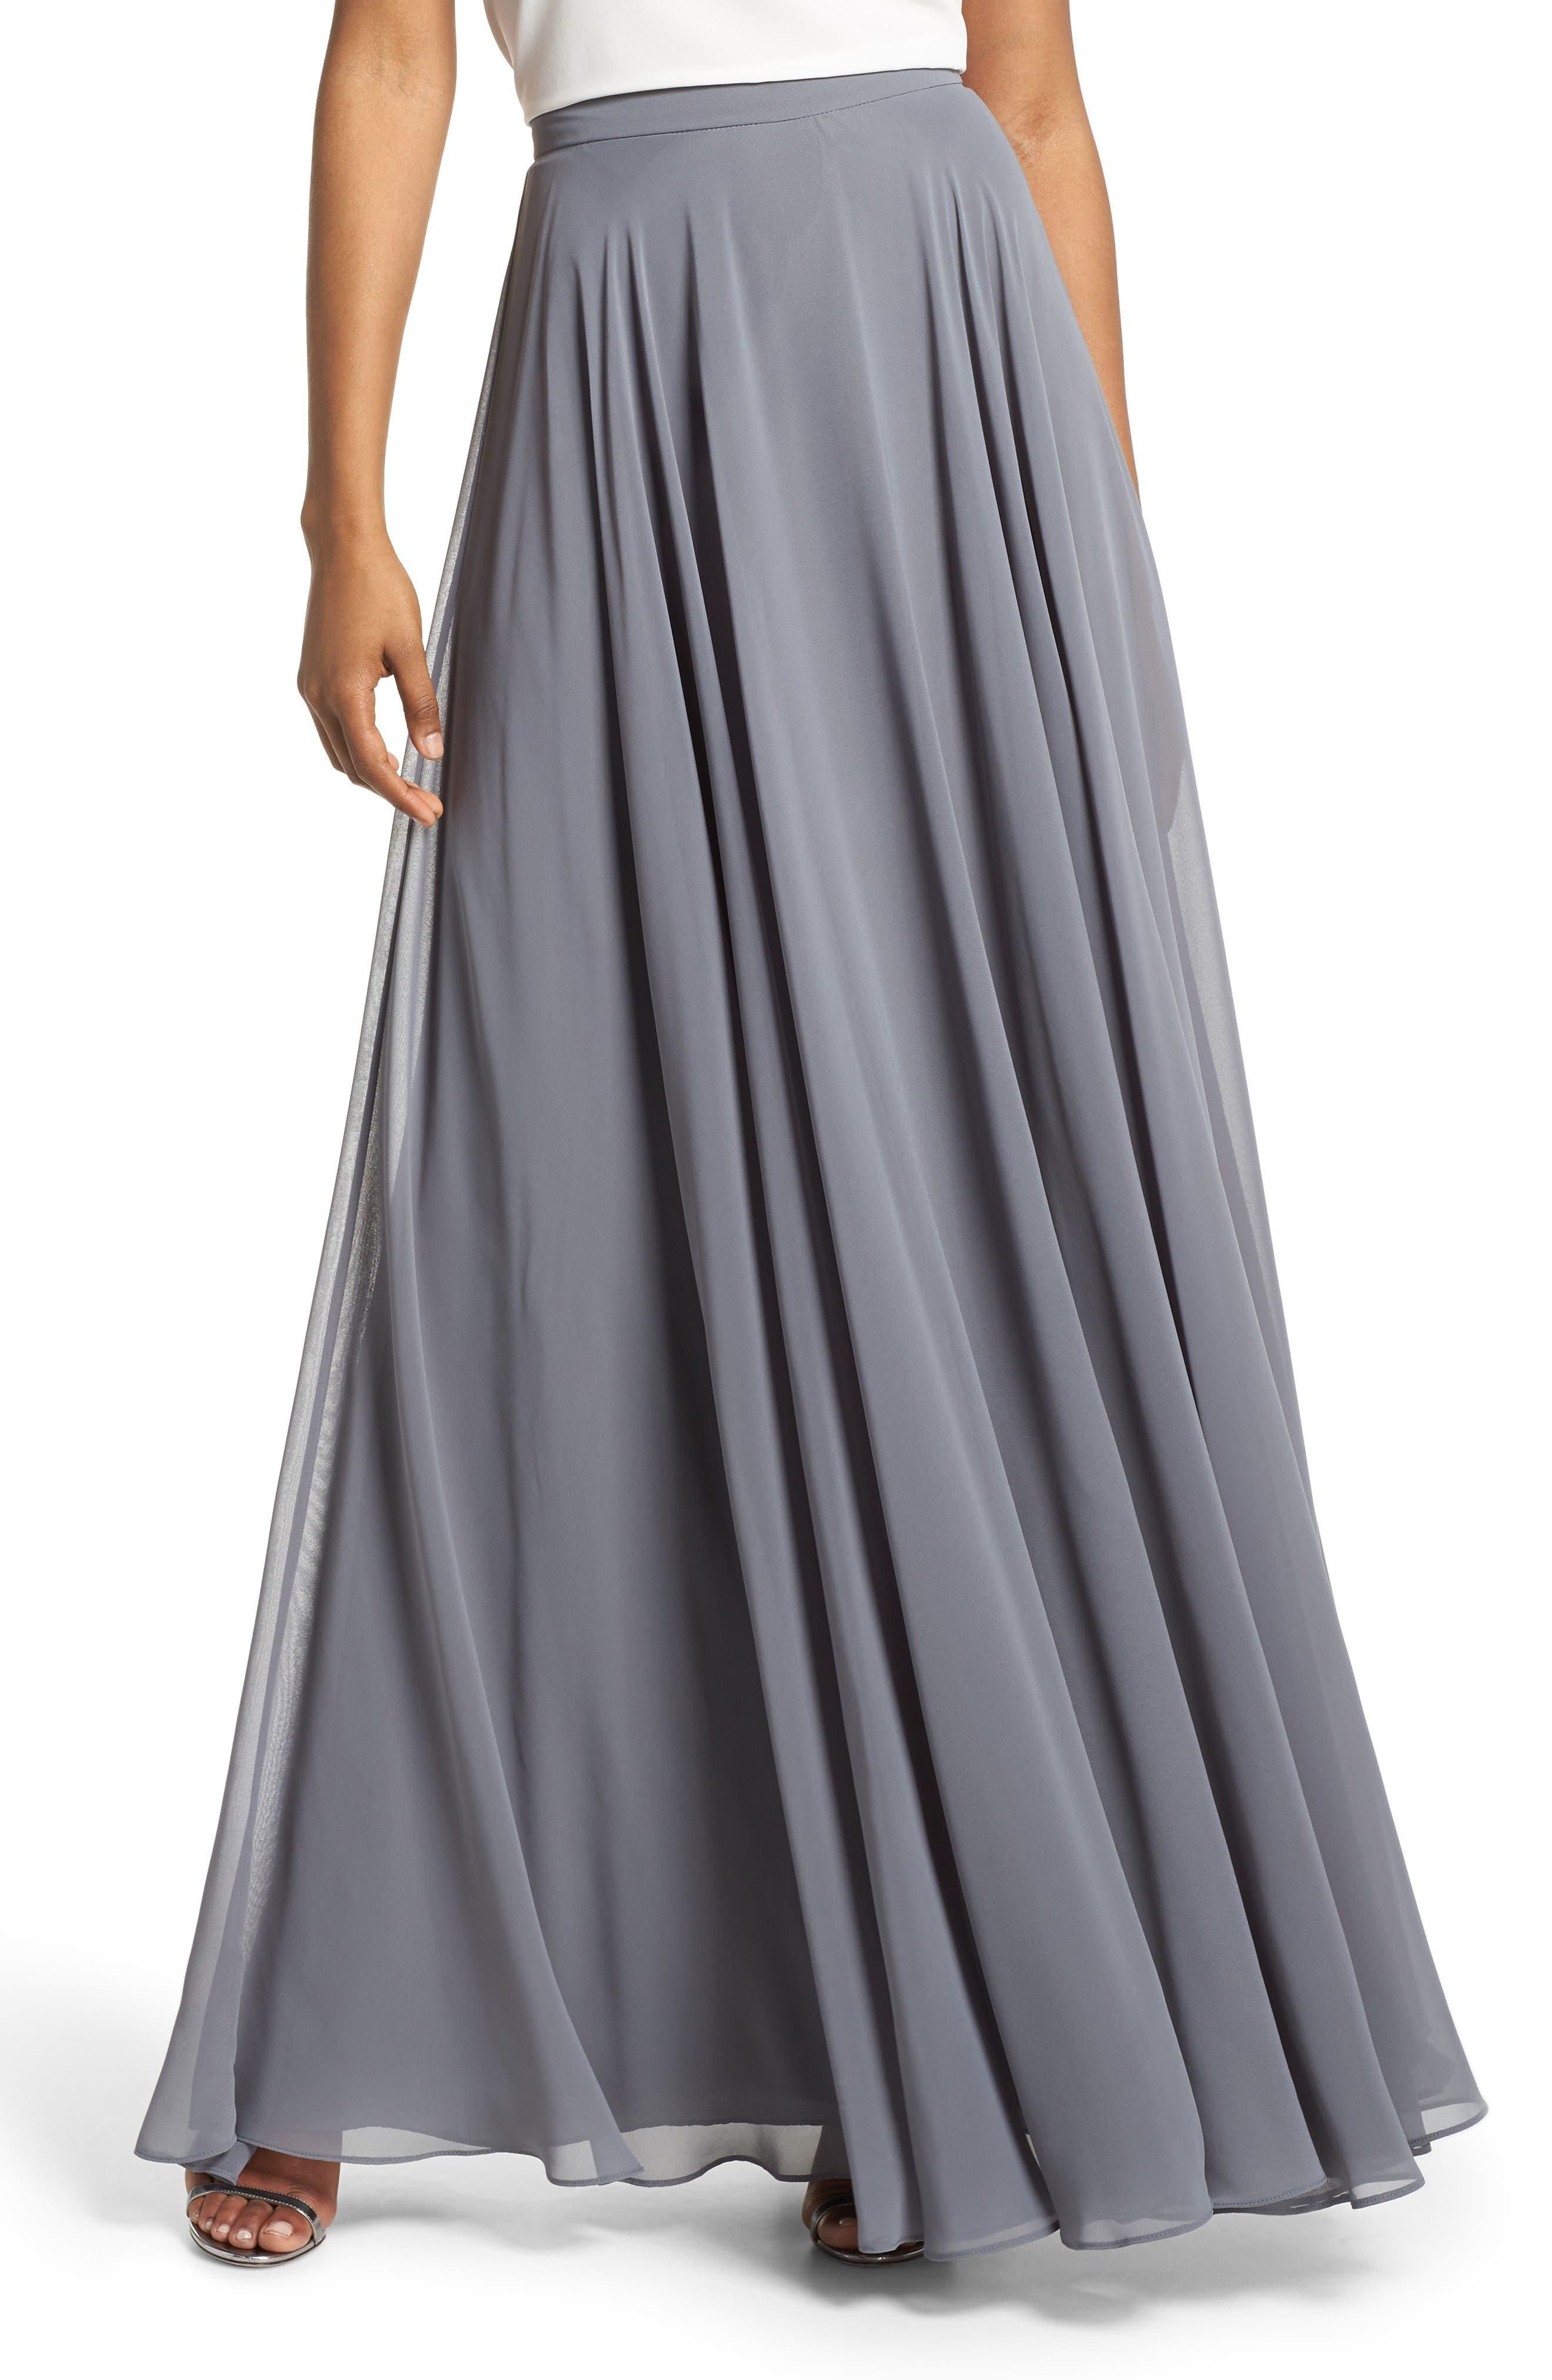 Image result for Hampton Long A-Line Chiffon Skirt JENNY YOO